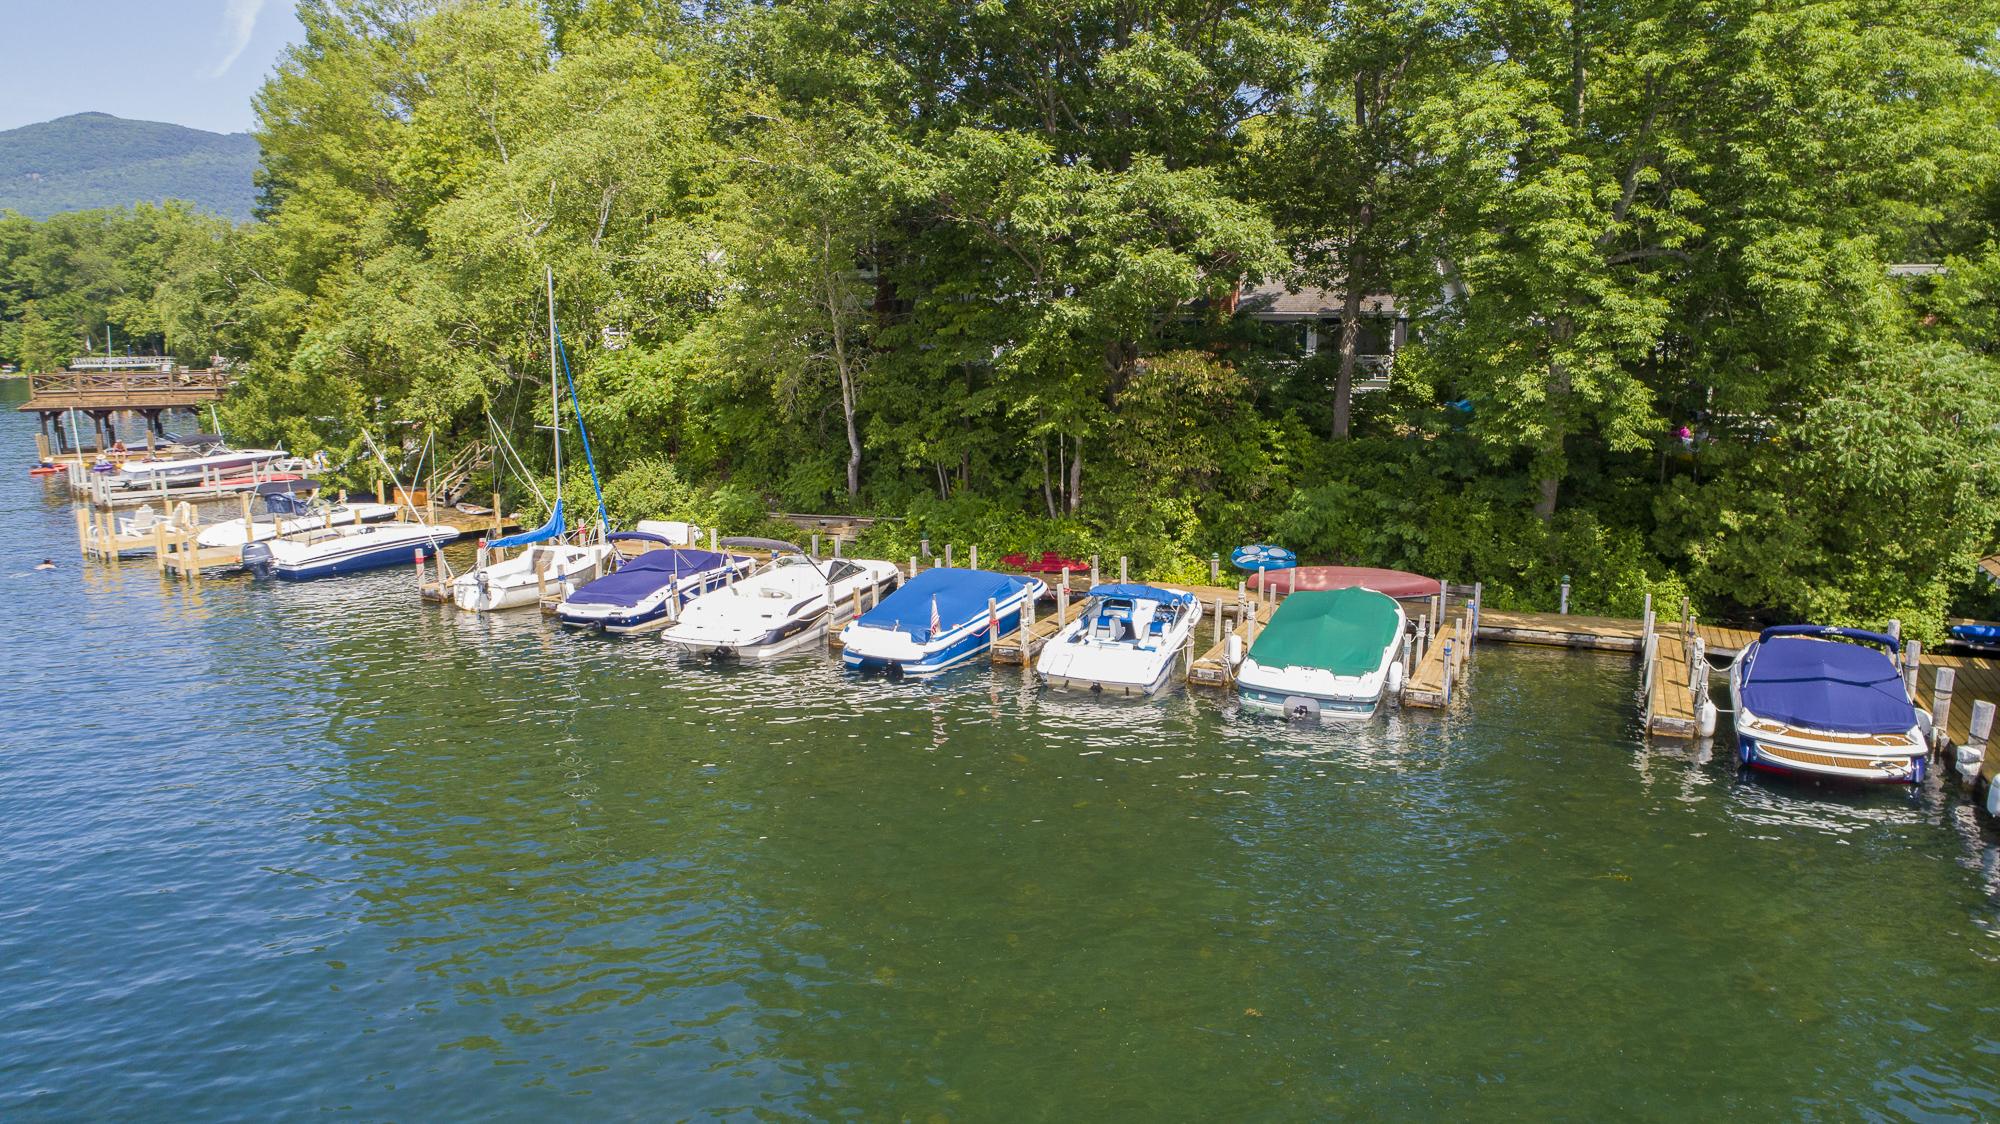 Takundewide Cottages on Lake George north finger slips